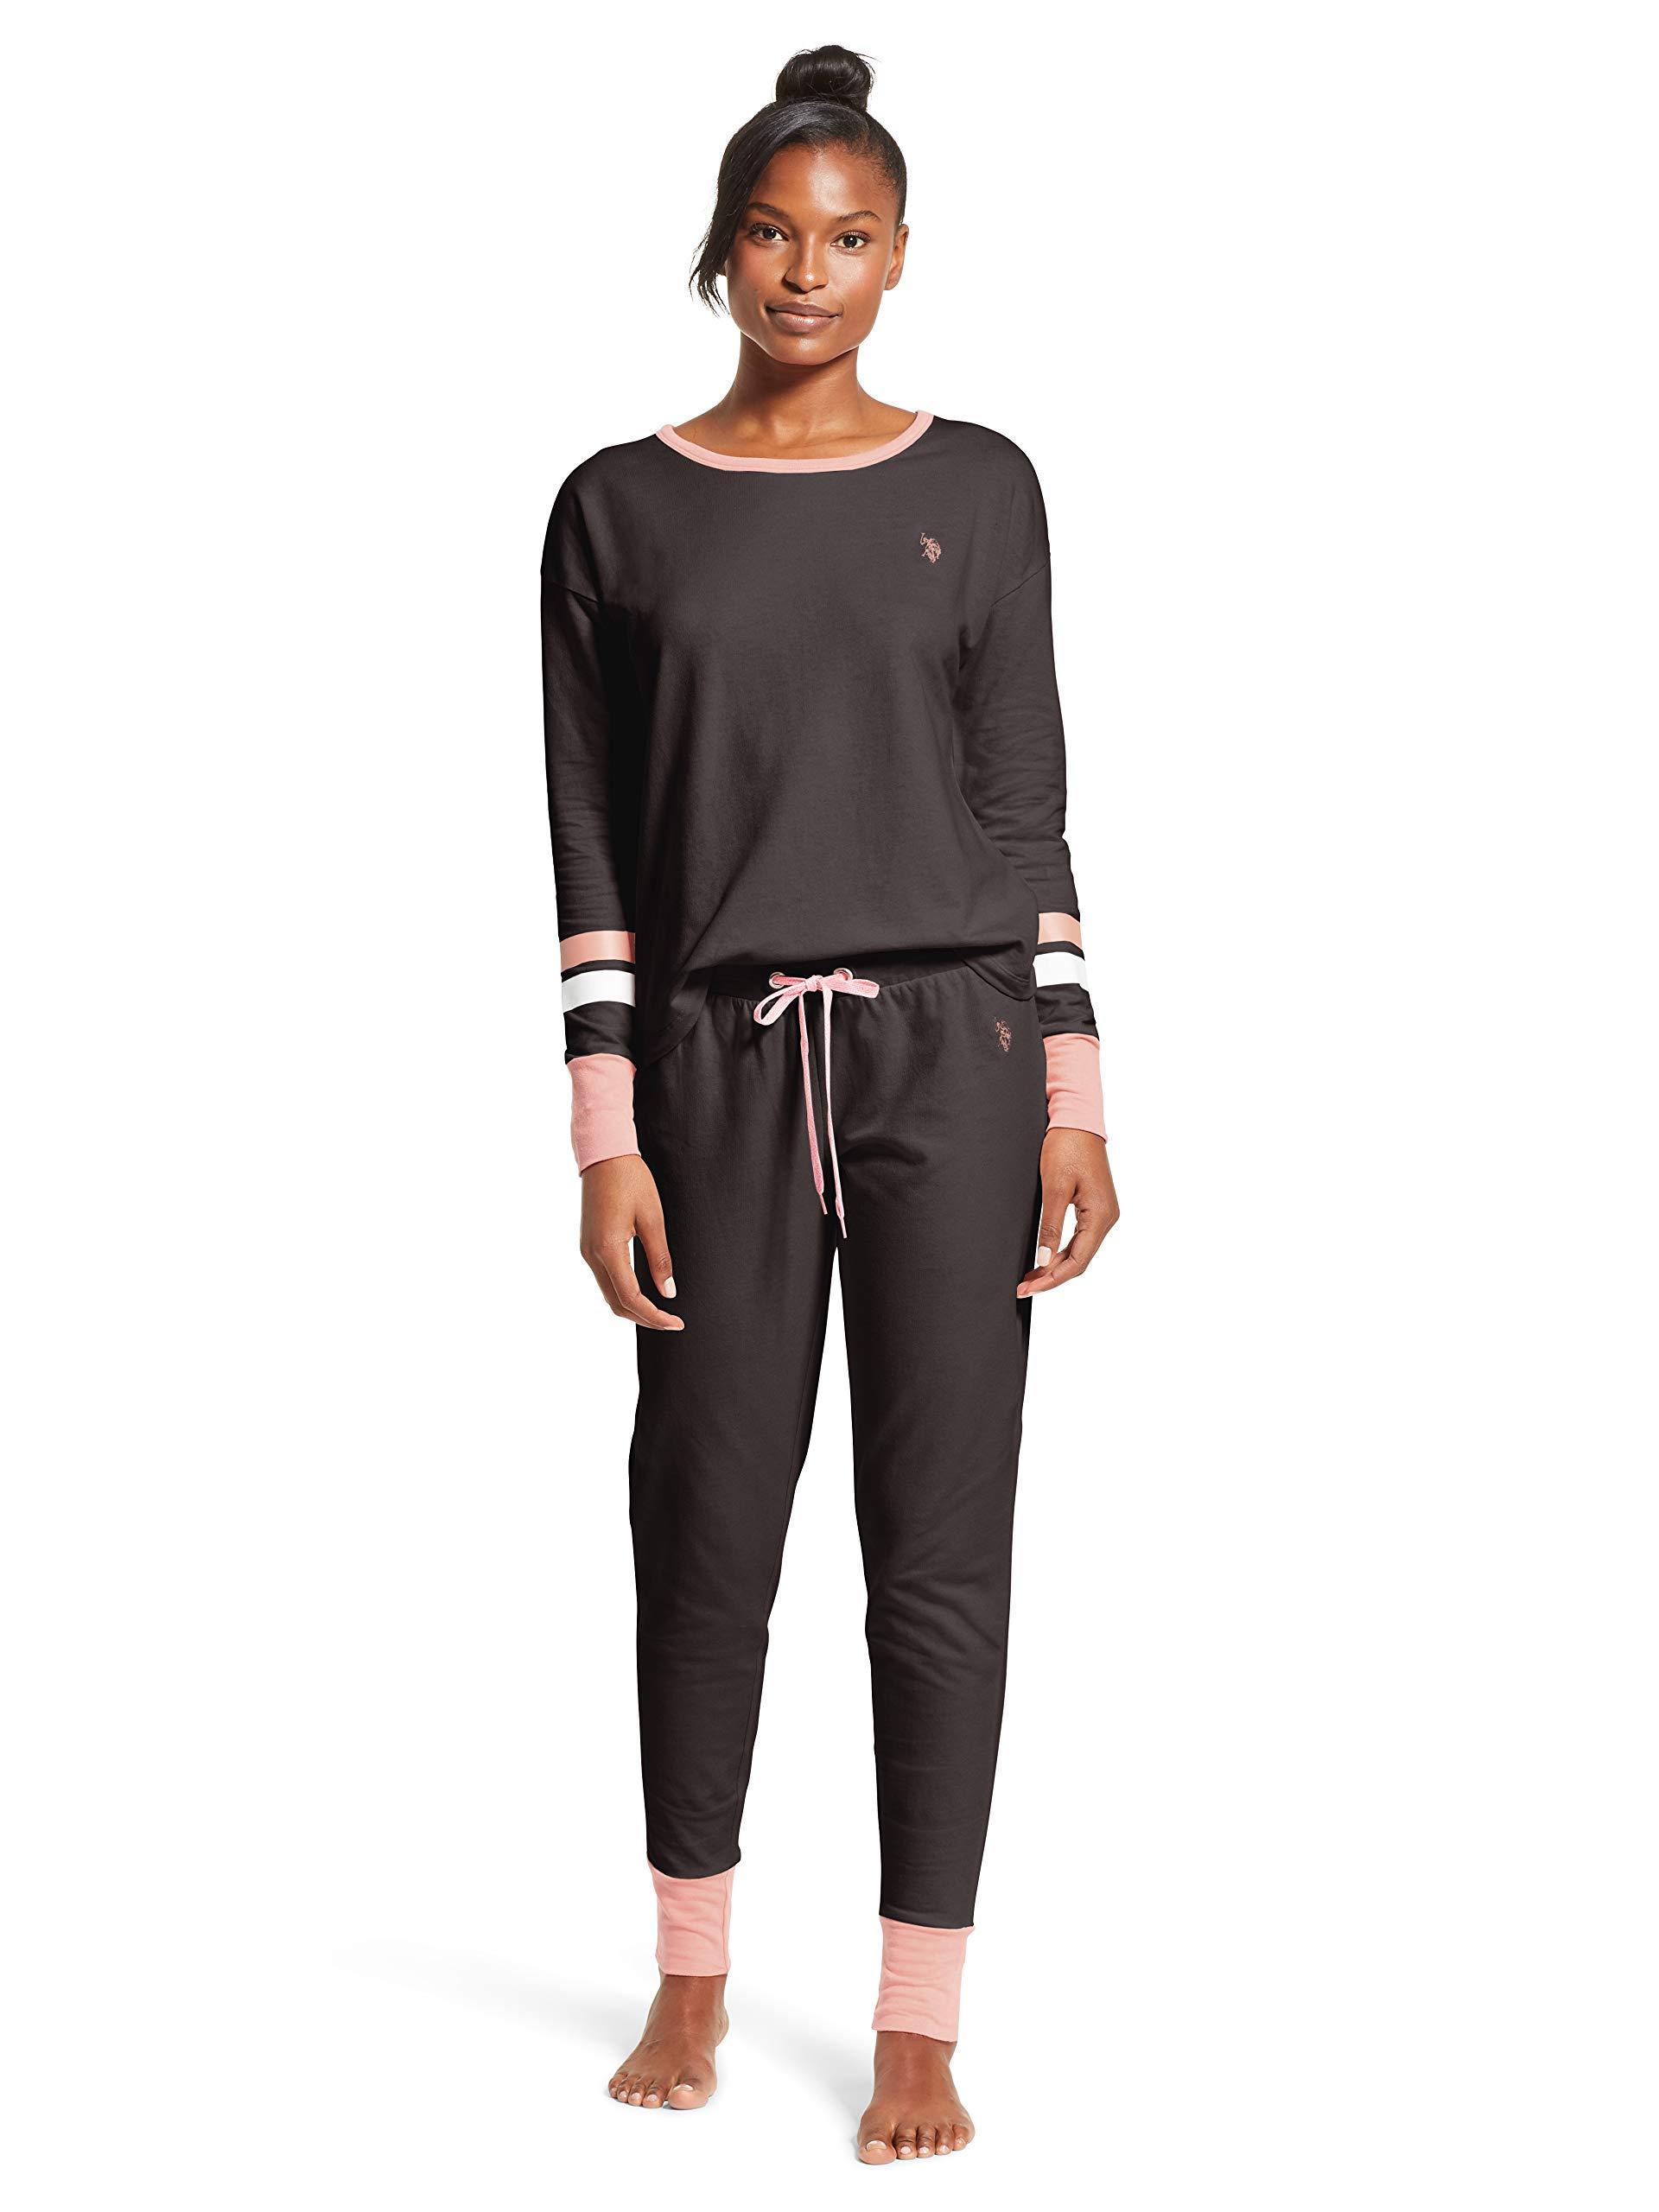 U.S. Polo Assn. Womens Cuffed Long Sleeve Shirt and Lounge Pajama Pants Sleep Set Dark Charcoal Heather X-Large by U.S. Polo Assn.